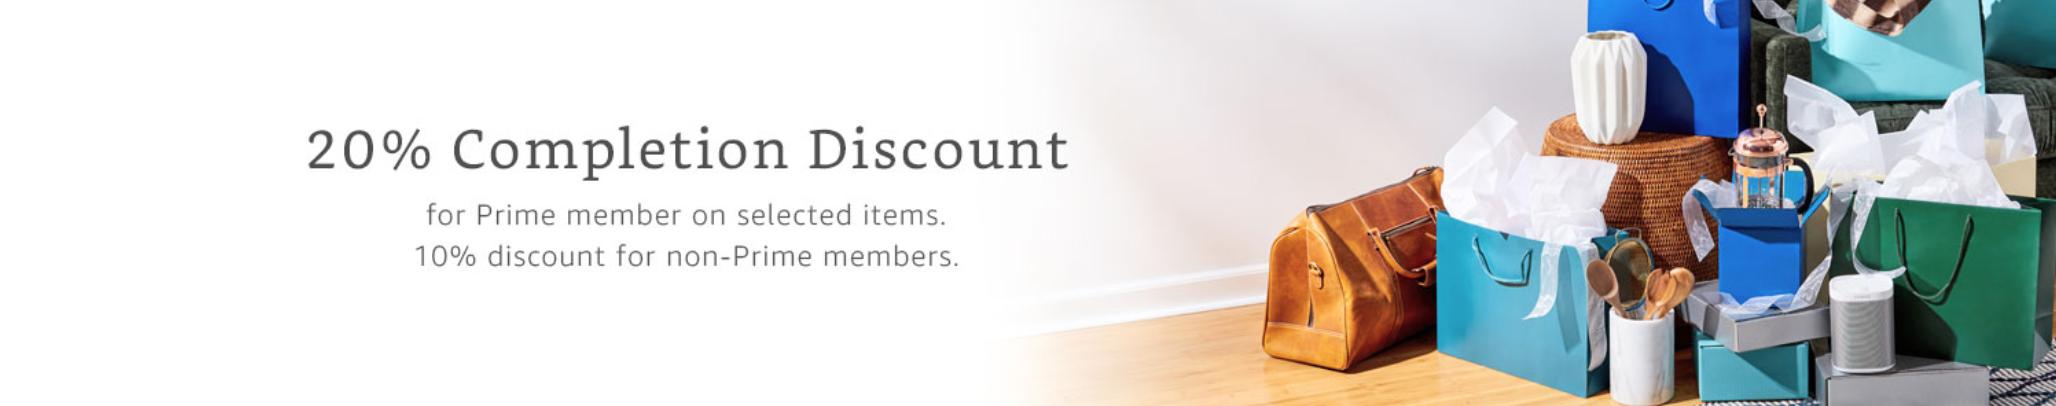 Amazon Wedding Registry Discount